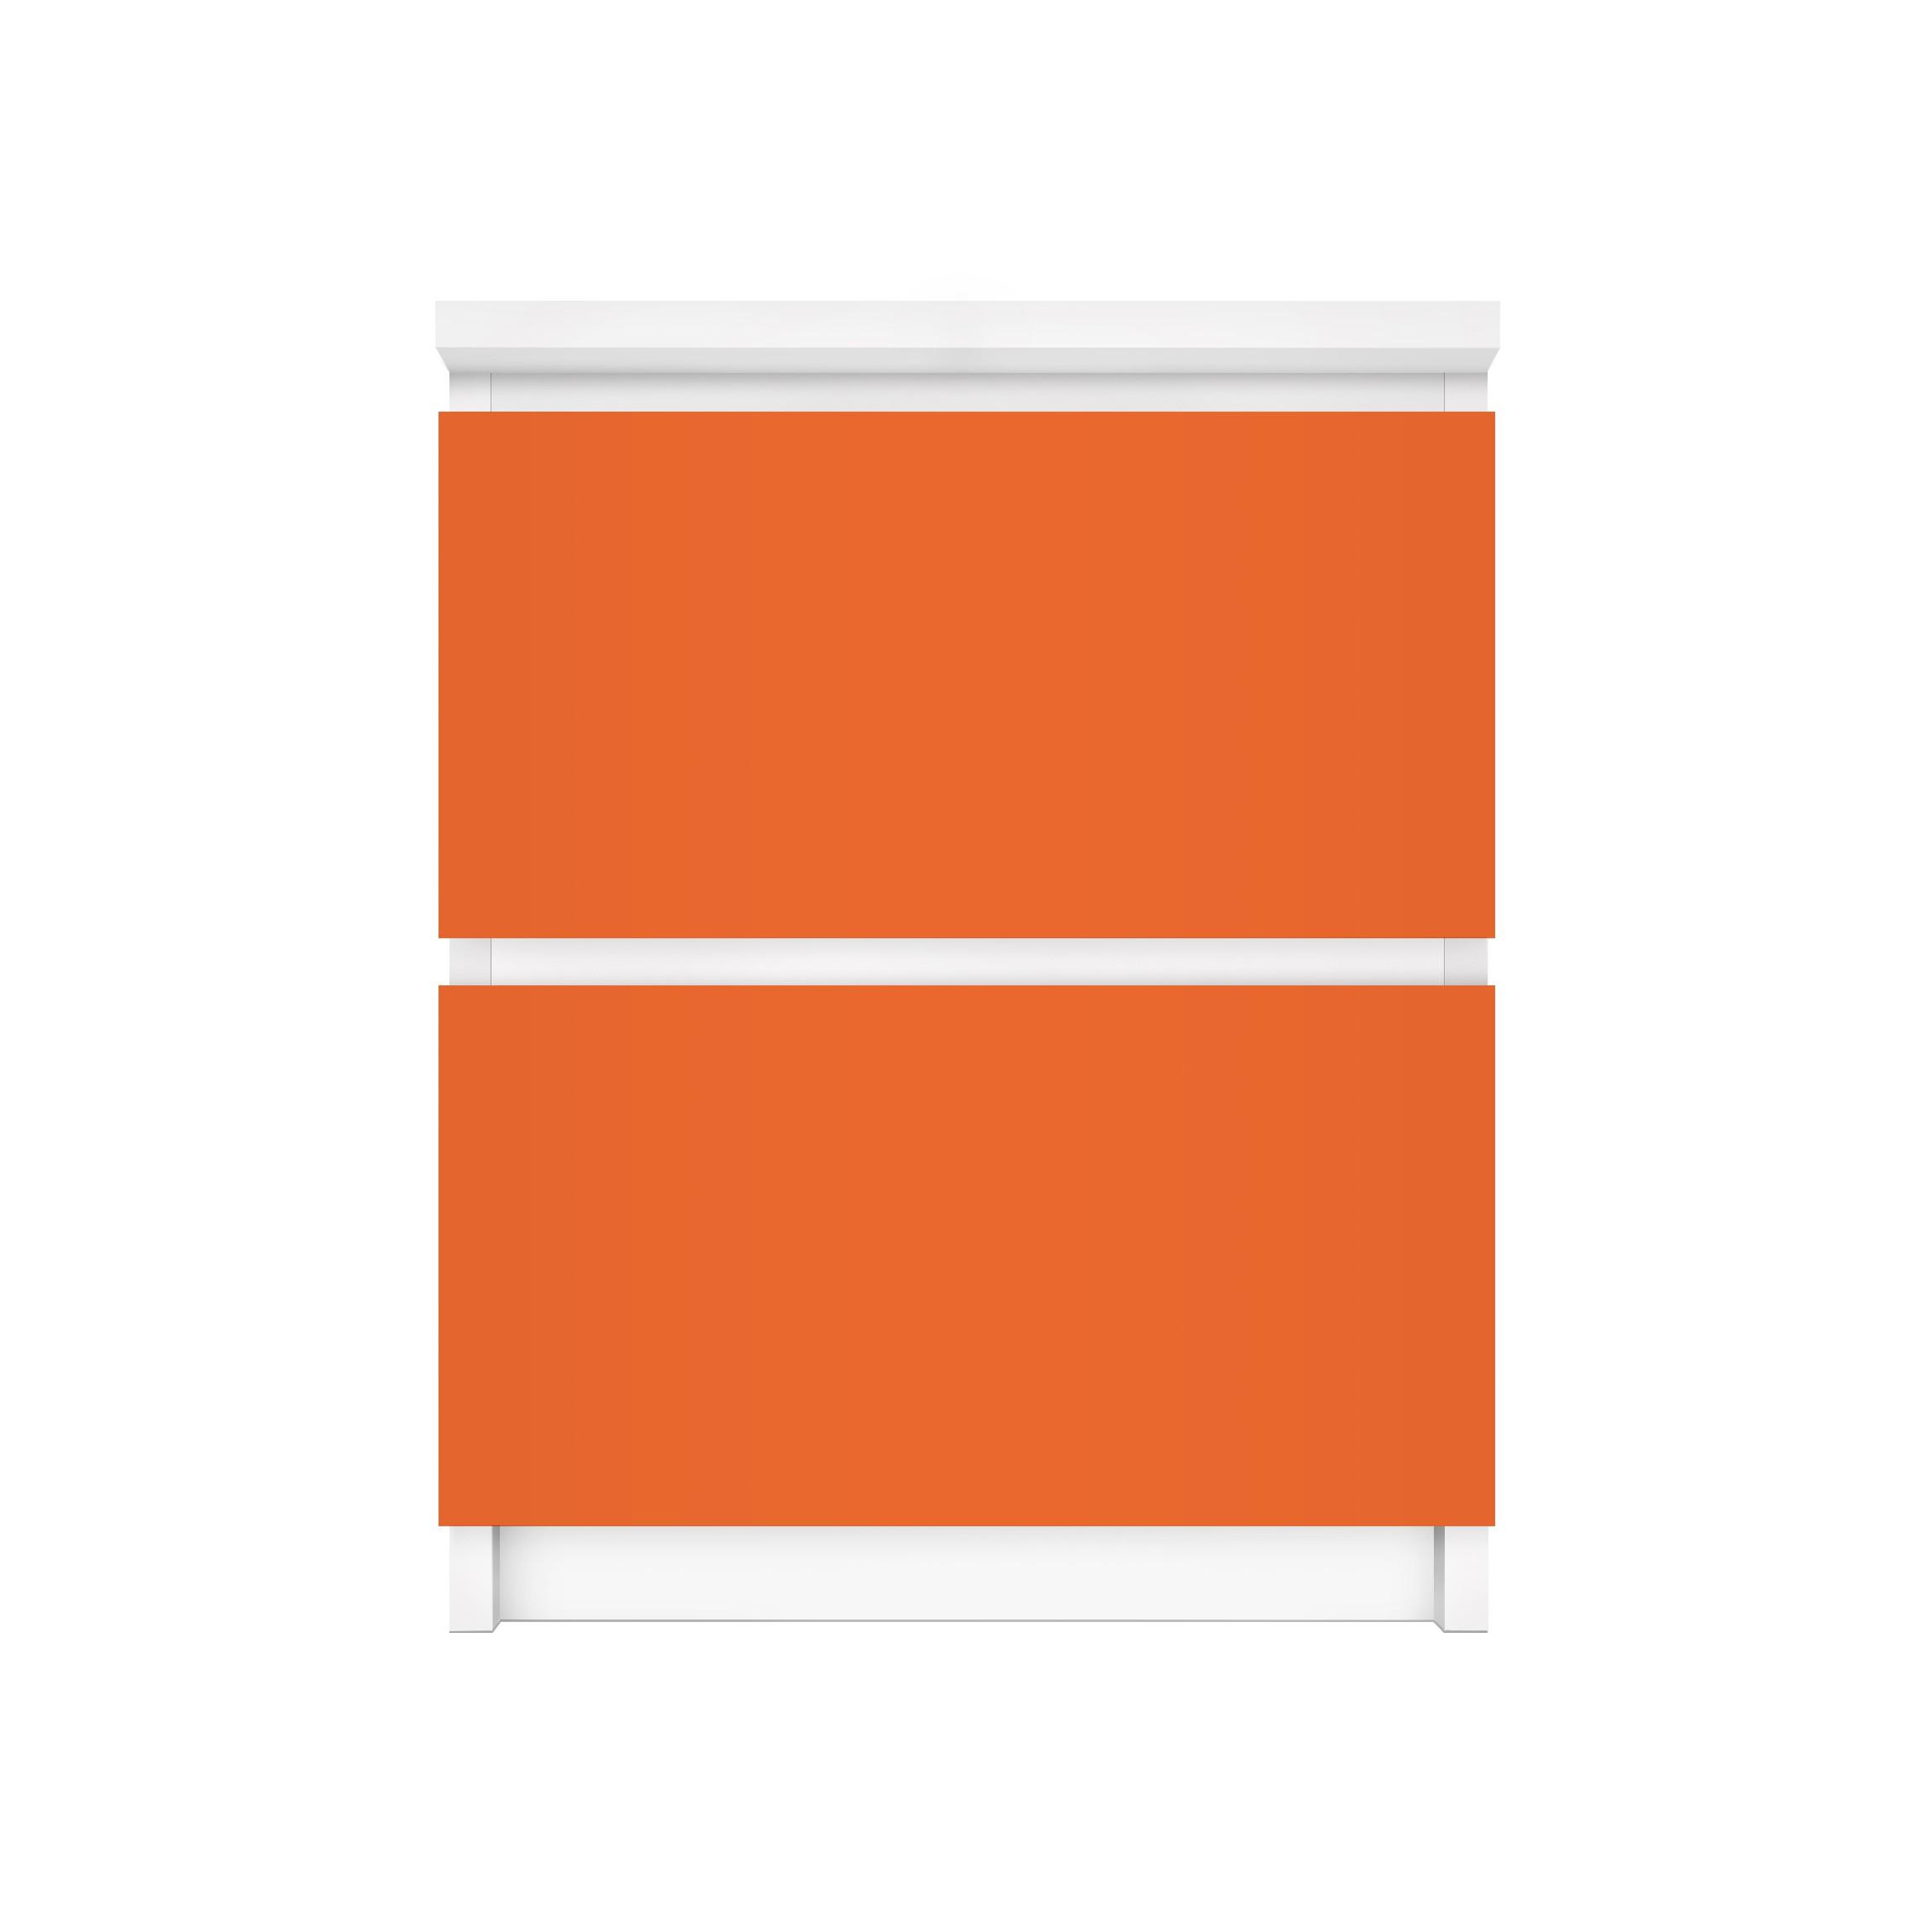 Mobelfolie Fur Ikea Malm Kommode Selbstklebefolie Colour Orange